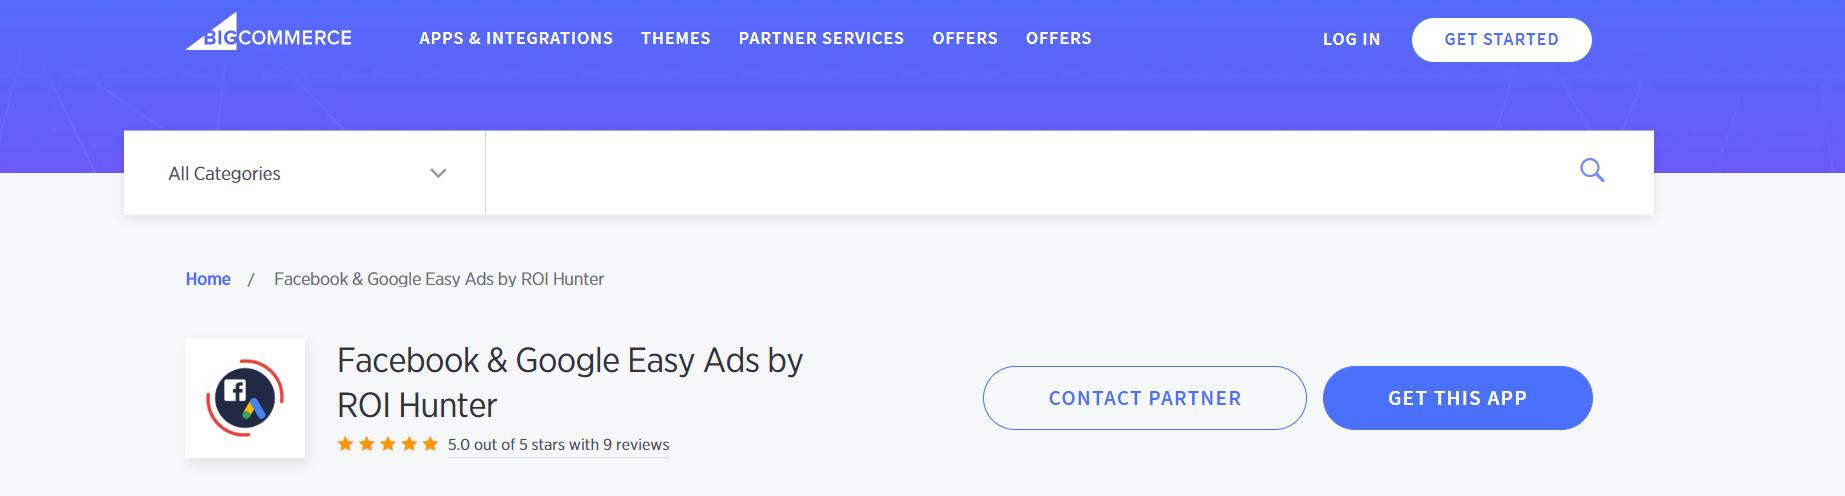 Facebook-&-Google-Easy-Ads-Landing